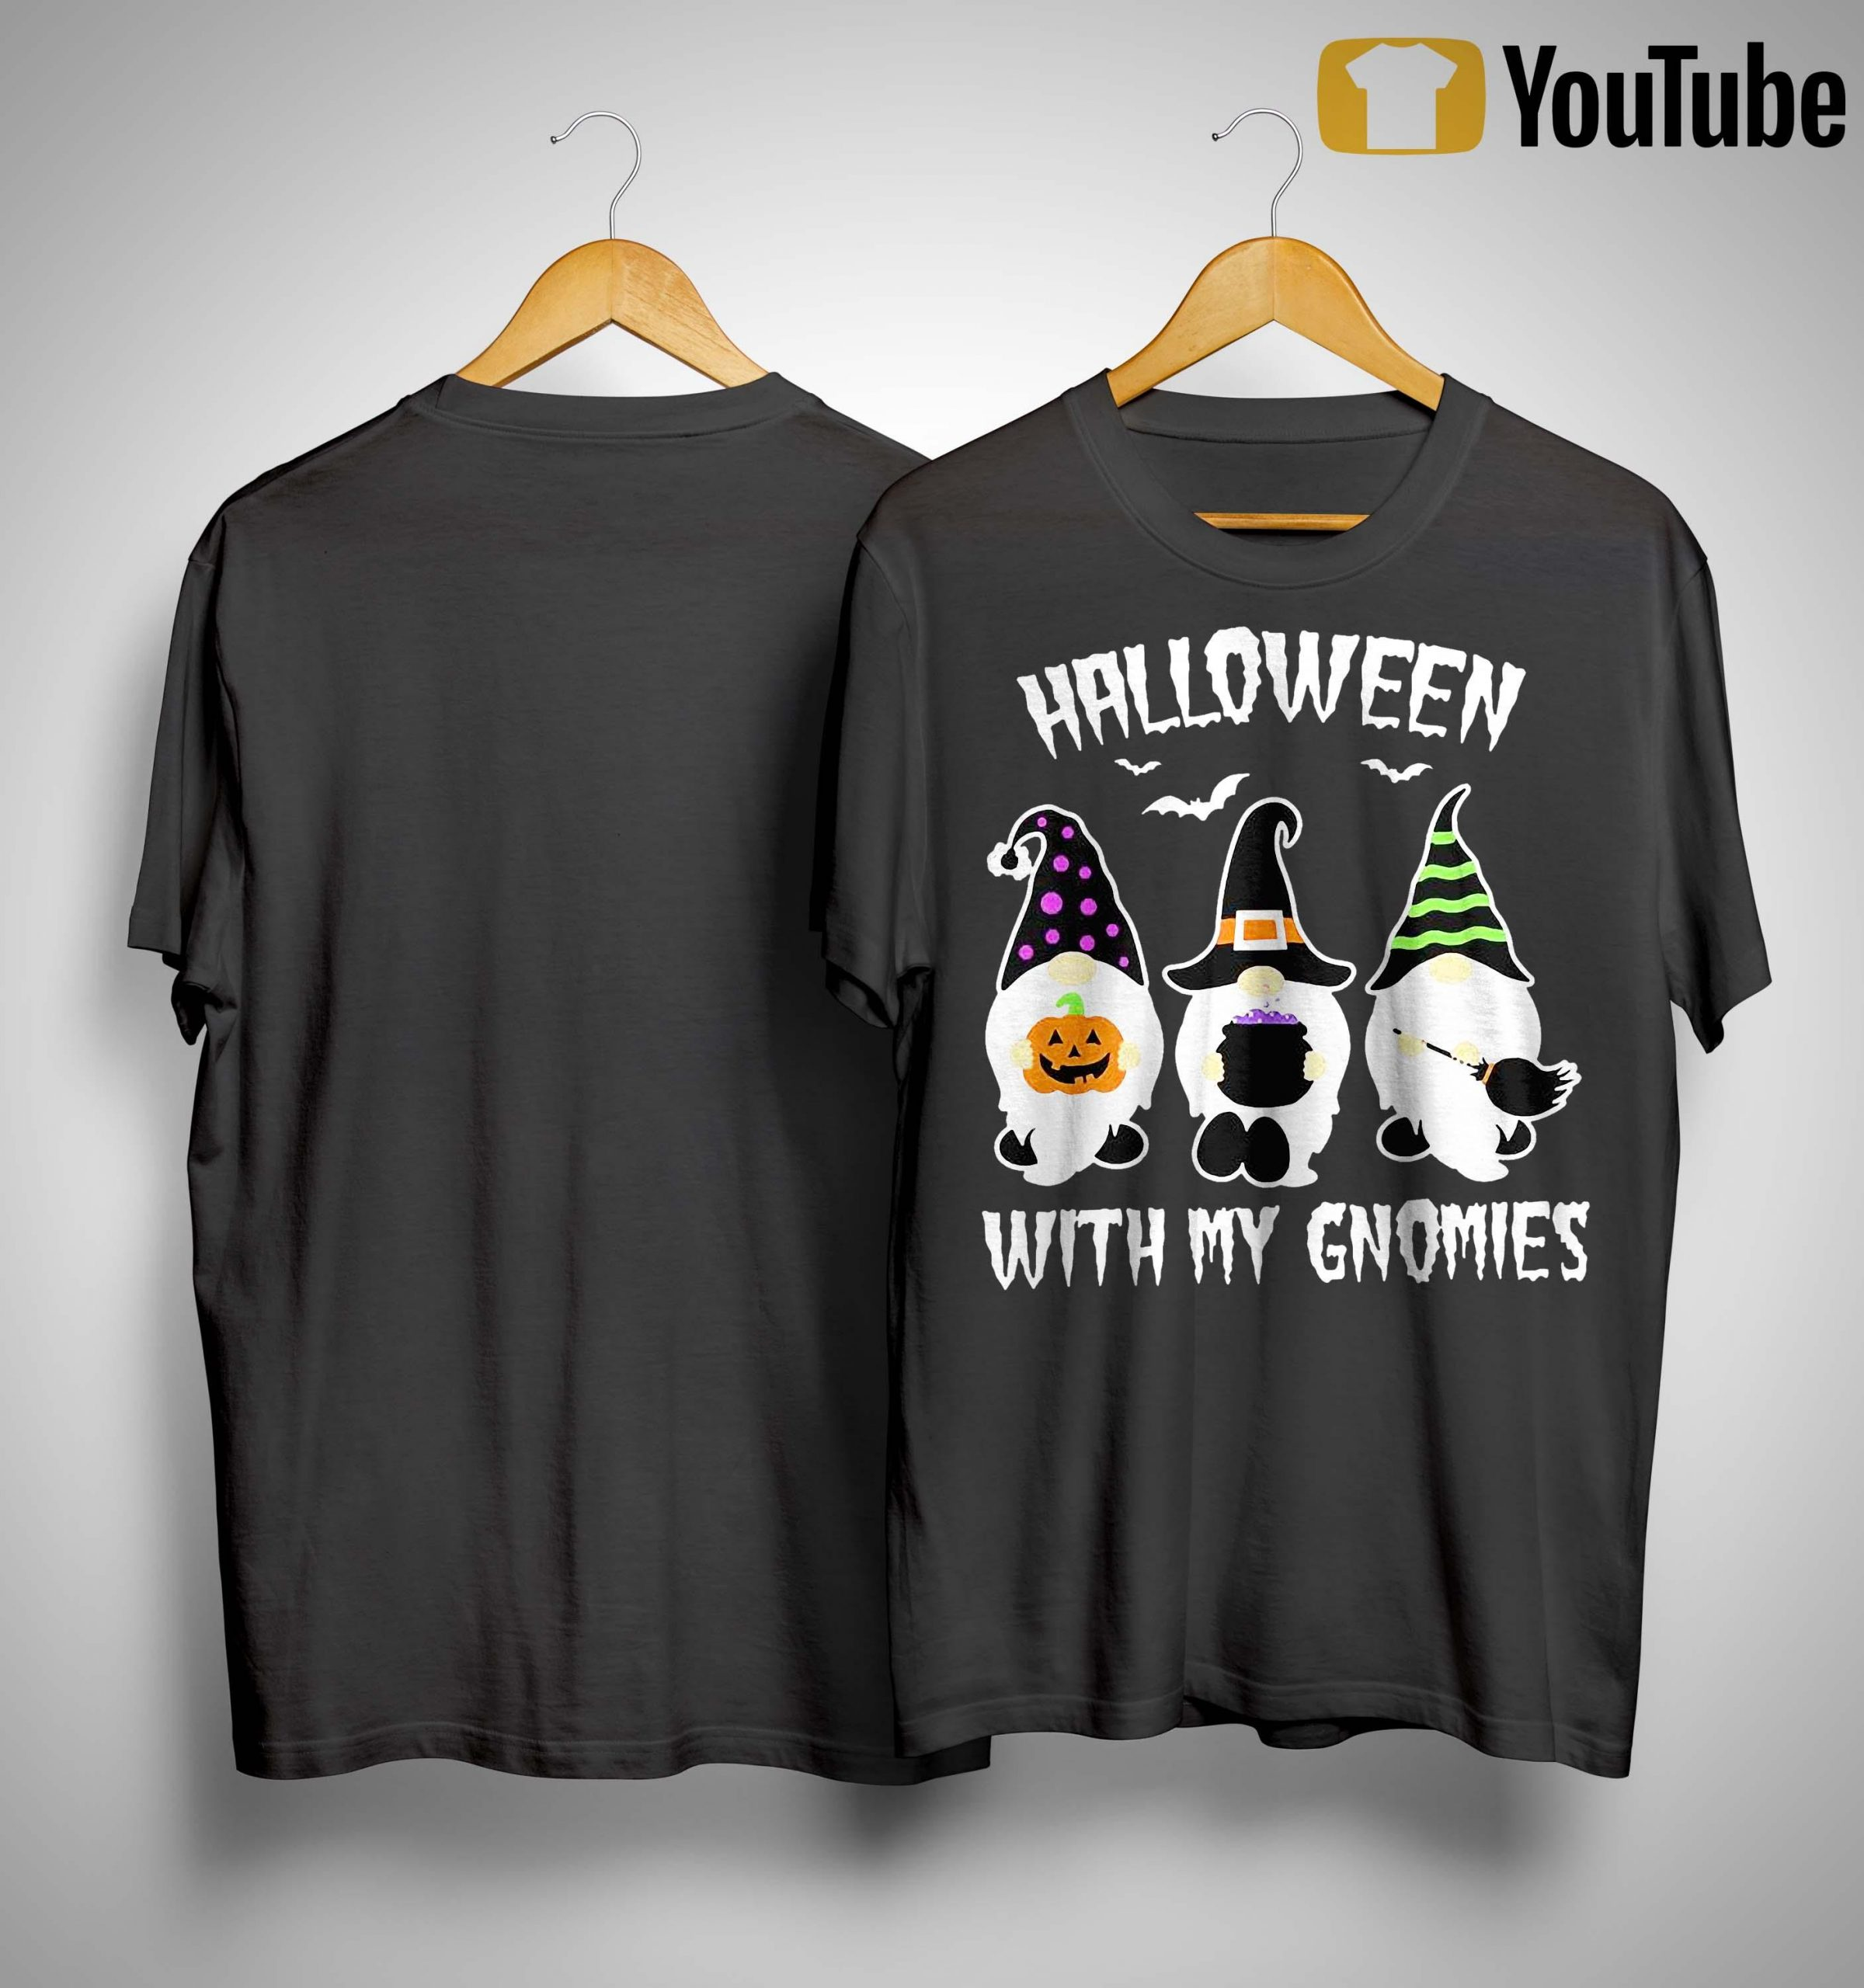 Halloween With My Gnomies Shirt